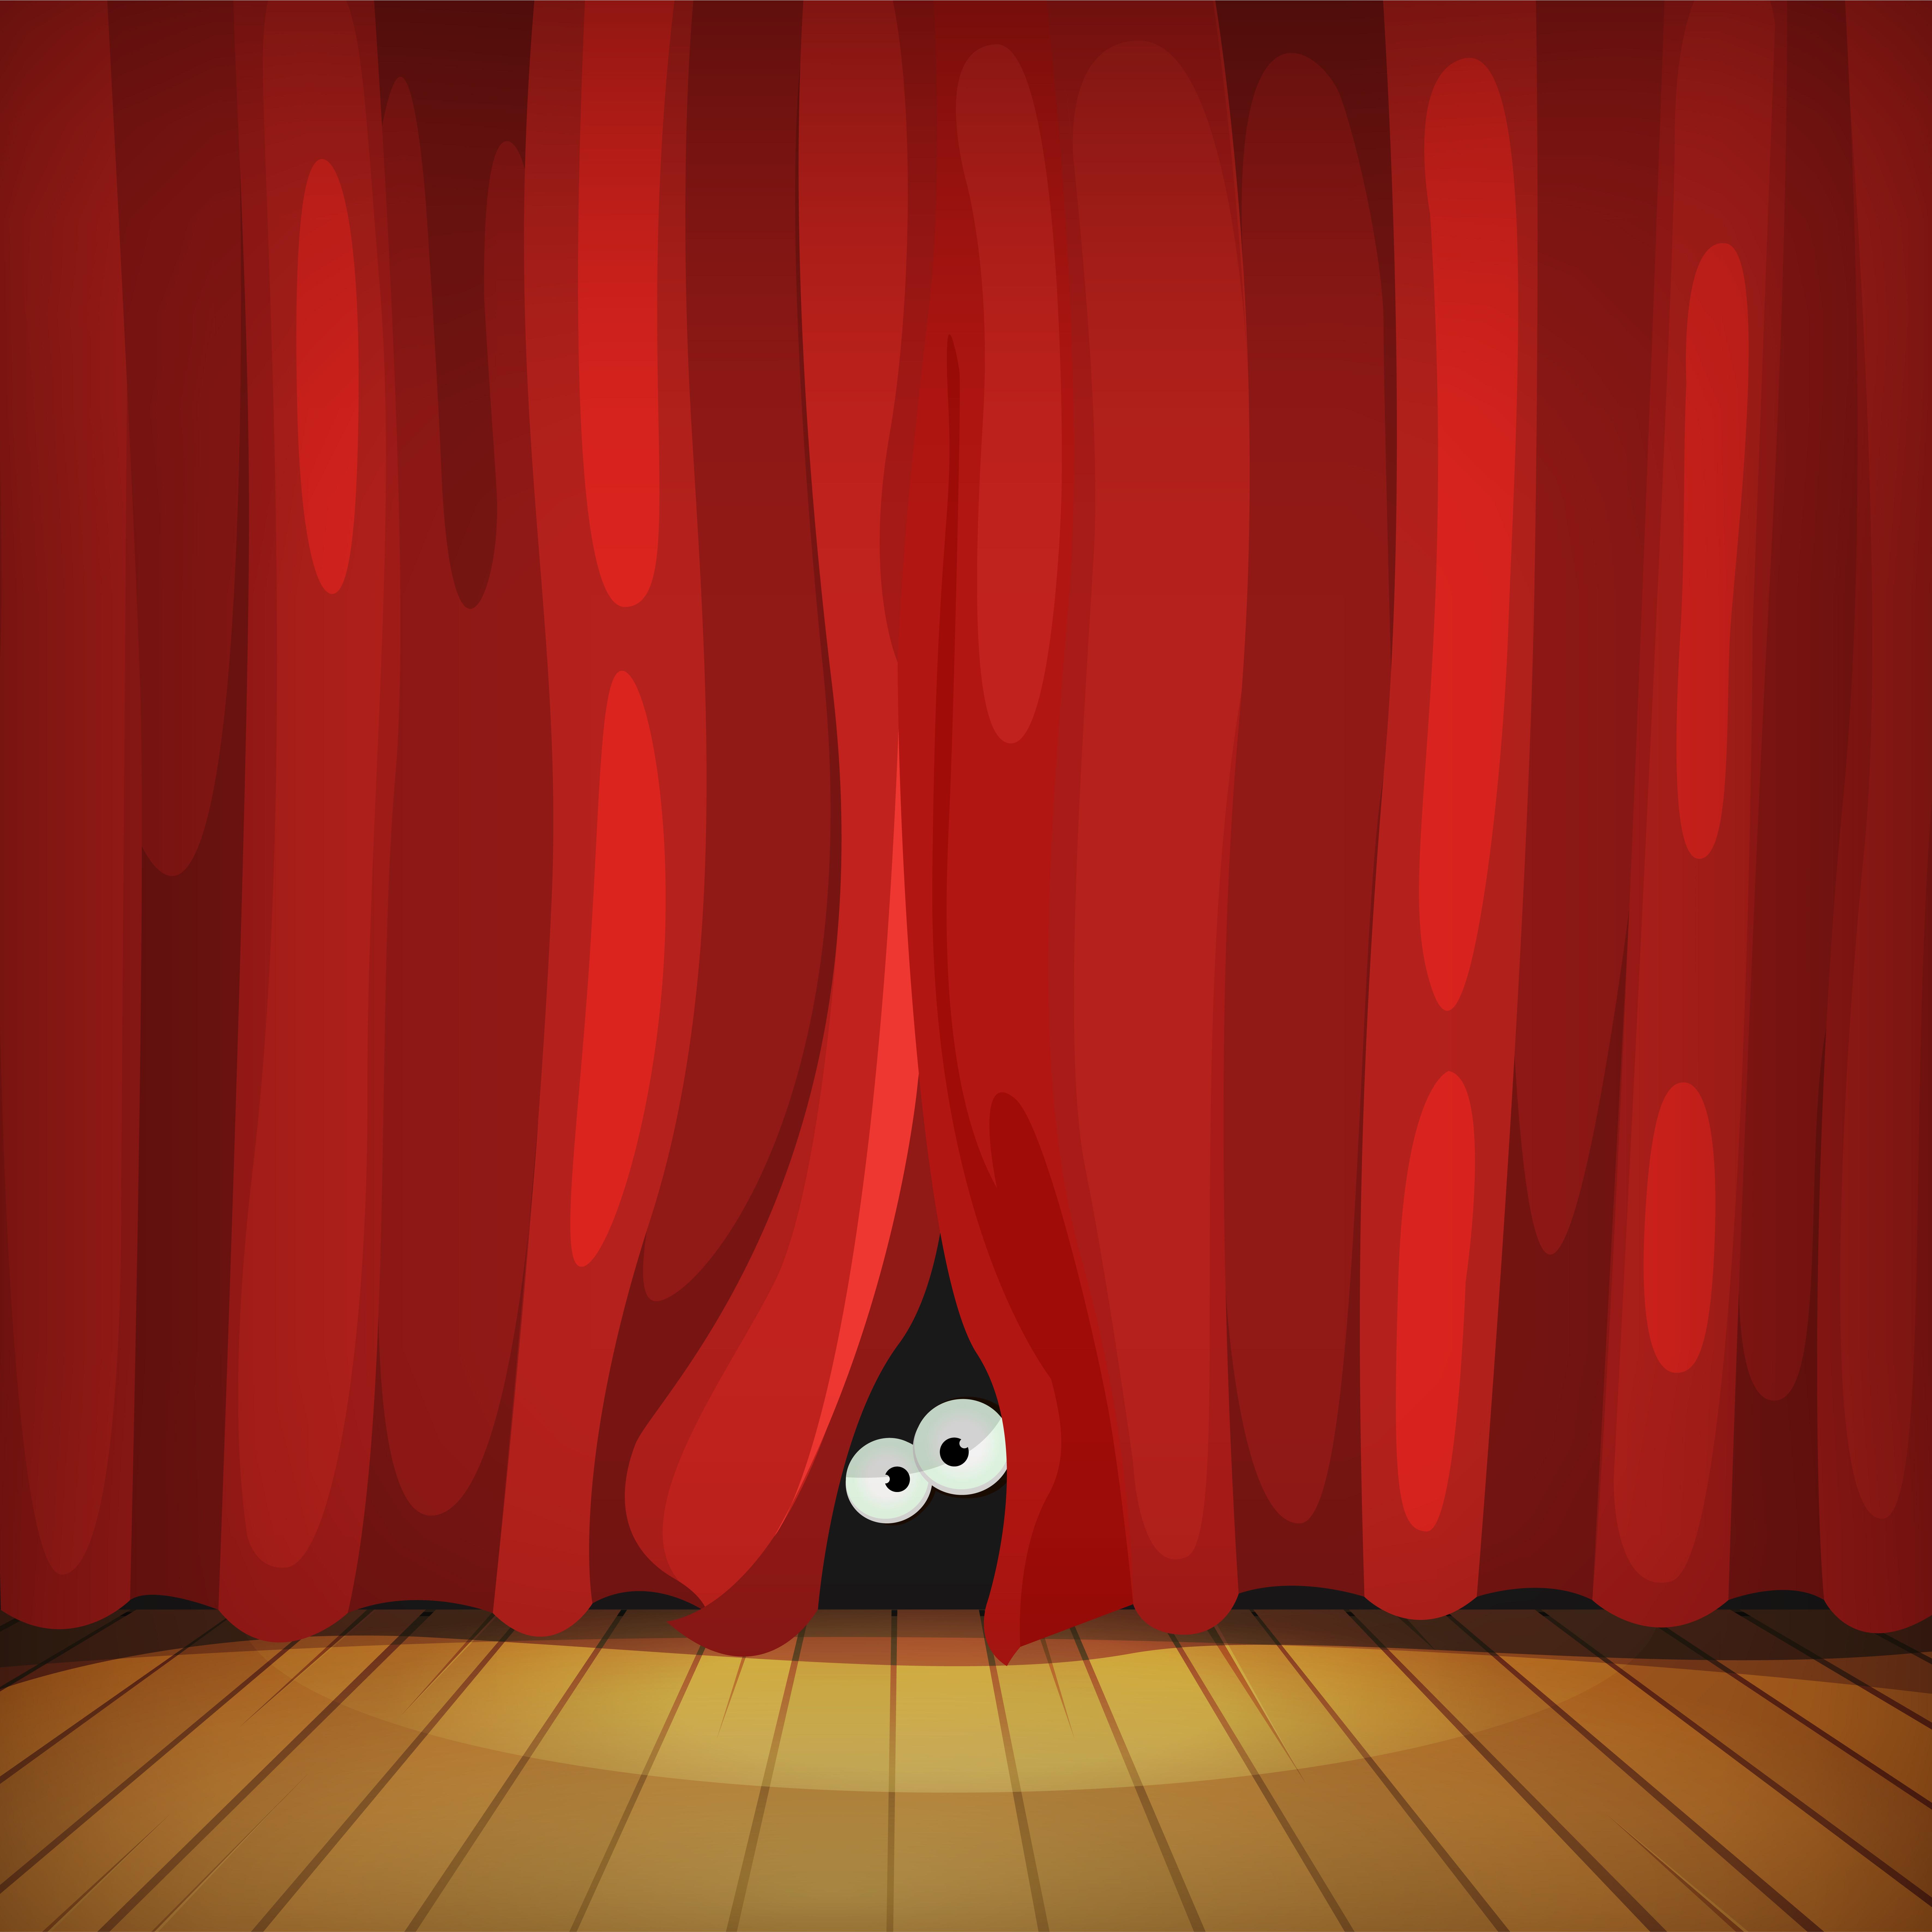 Eyes Behind Red Curtains On Wood Stage.